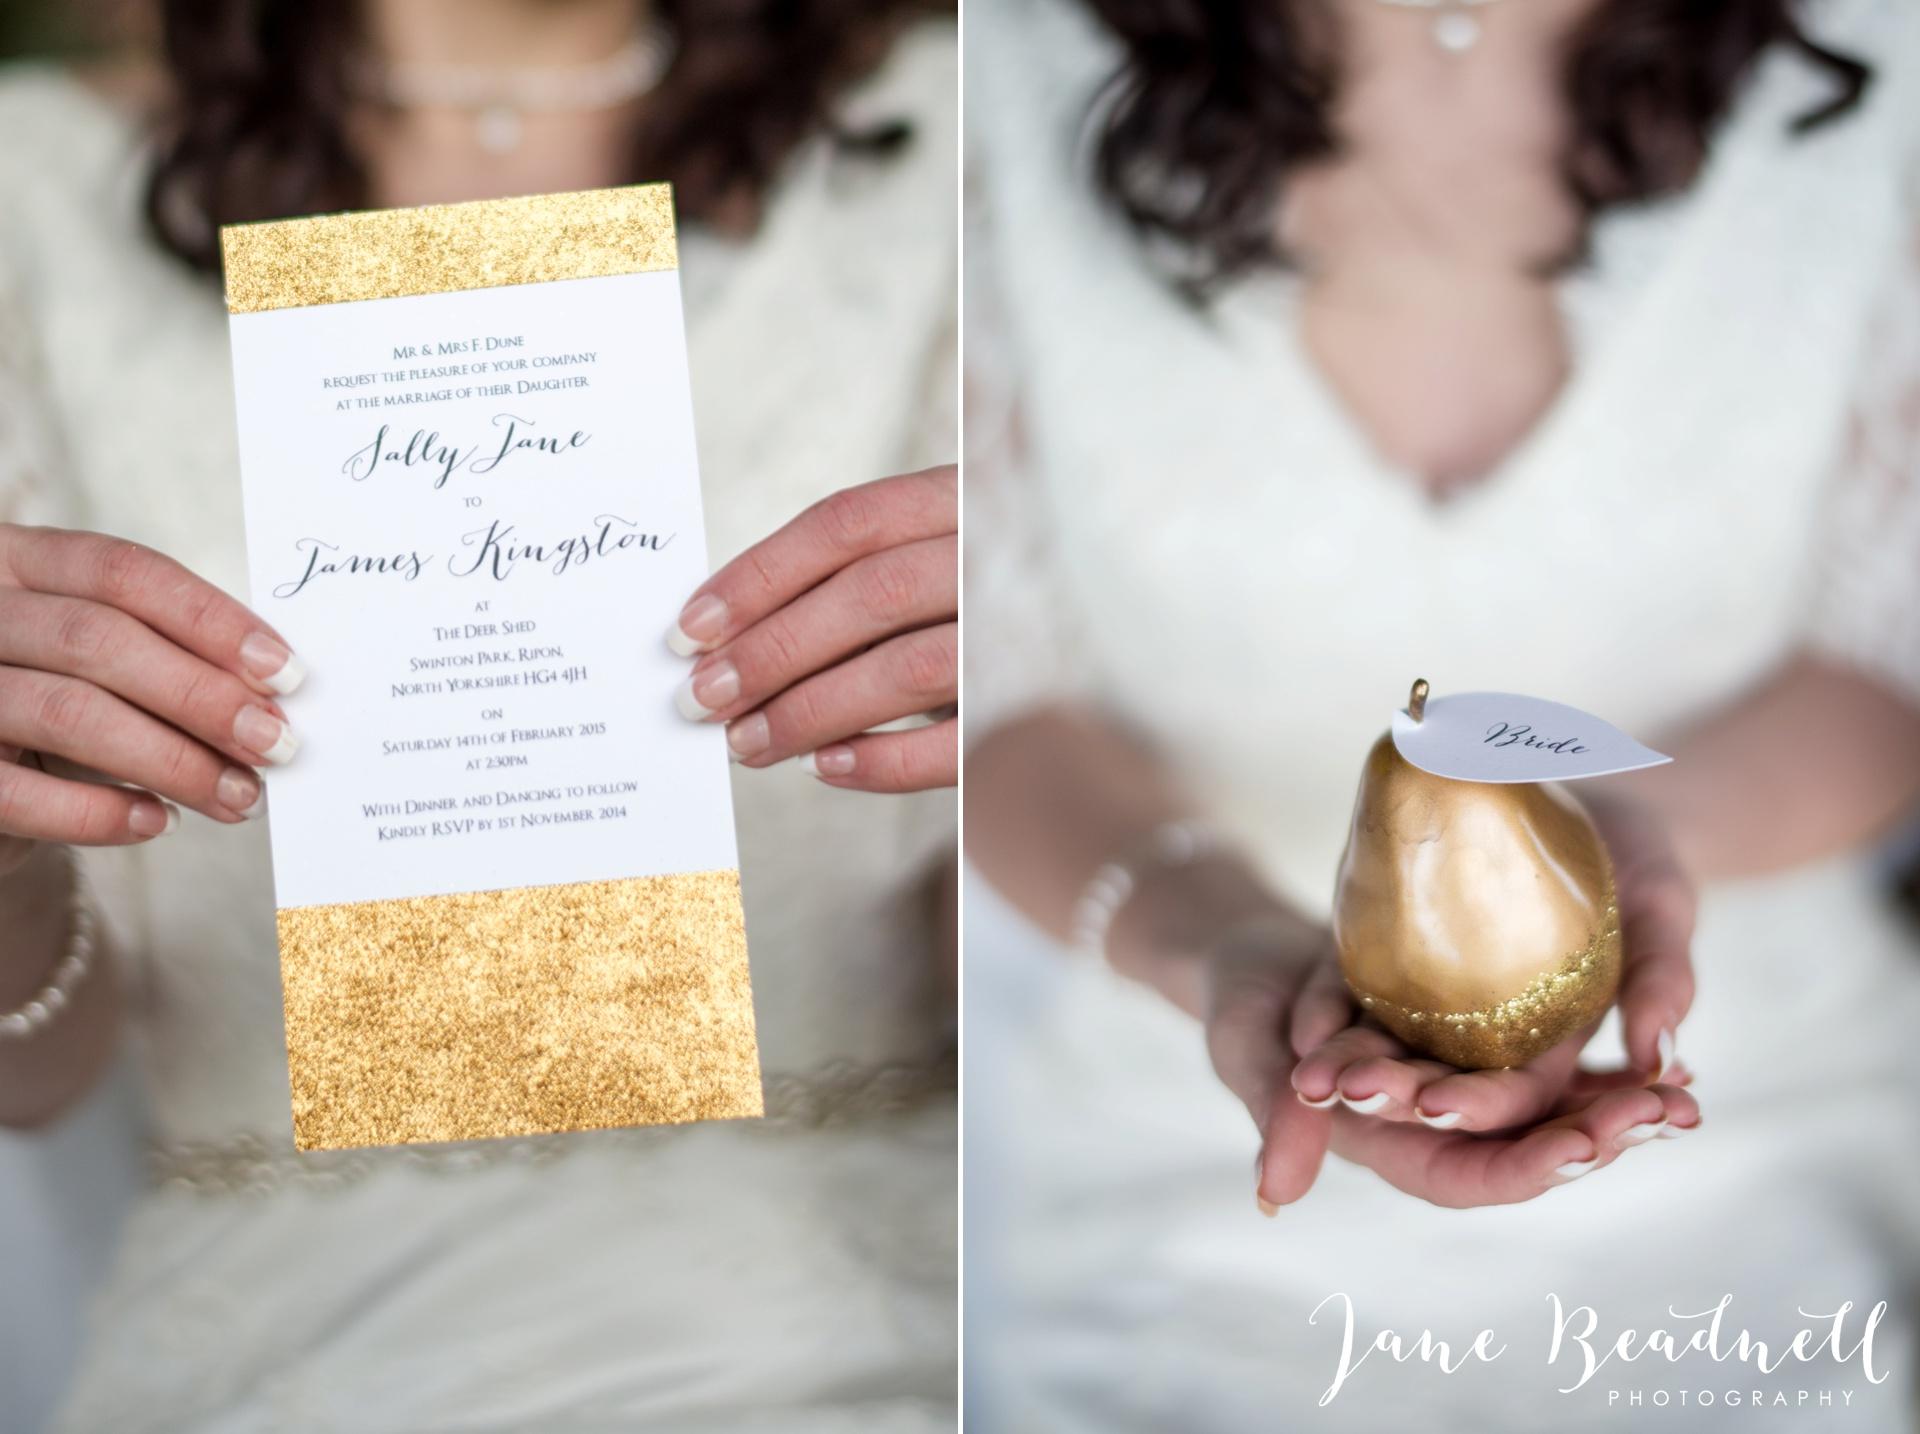 Jane Beadnell fine art wedding photographer Swinton Park19